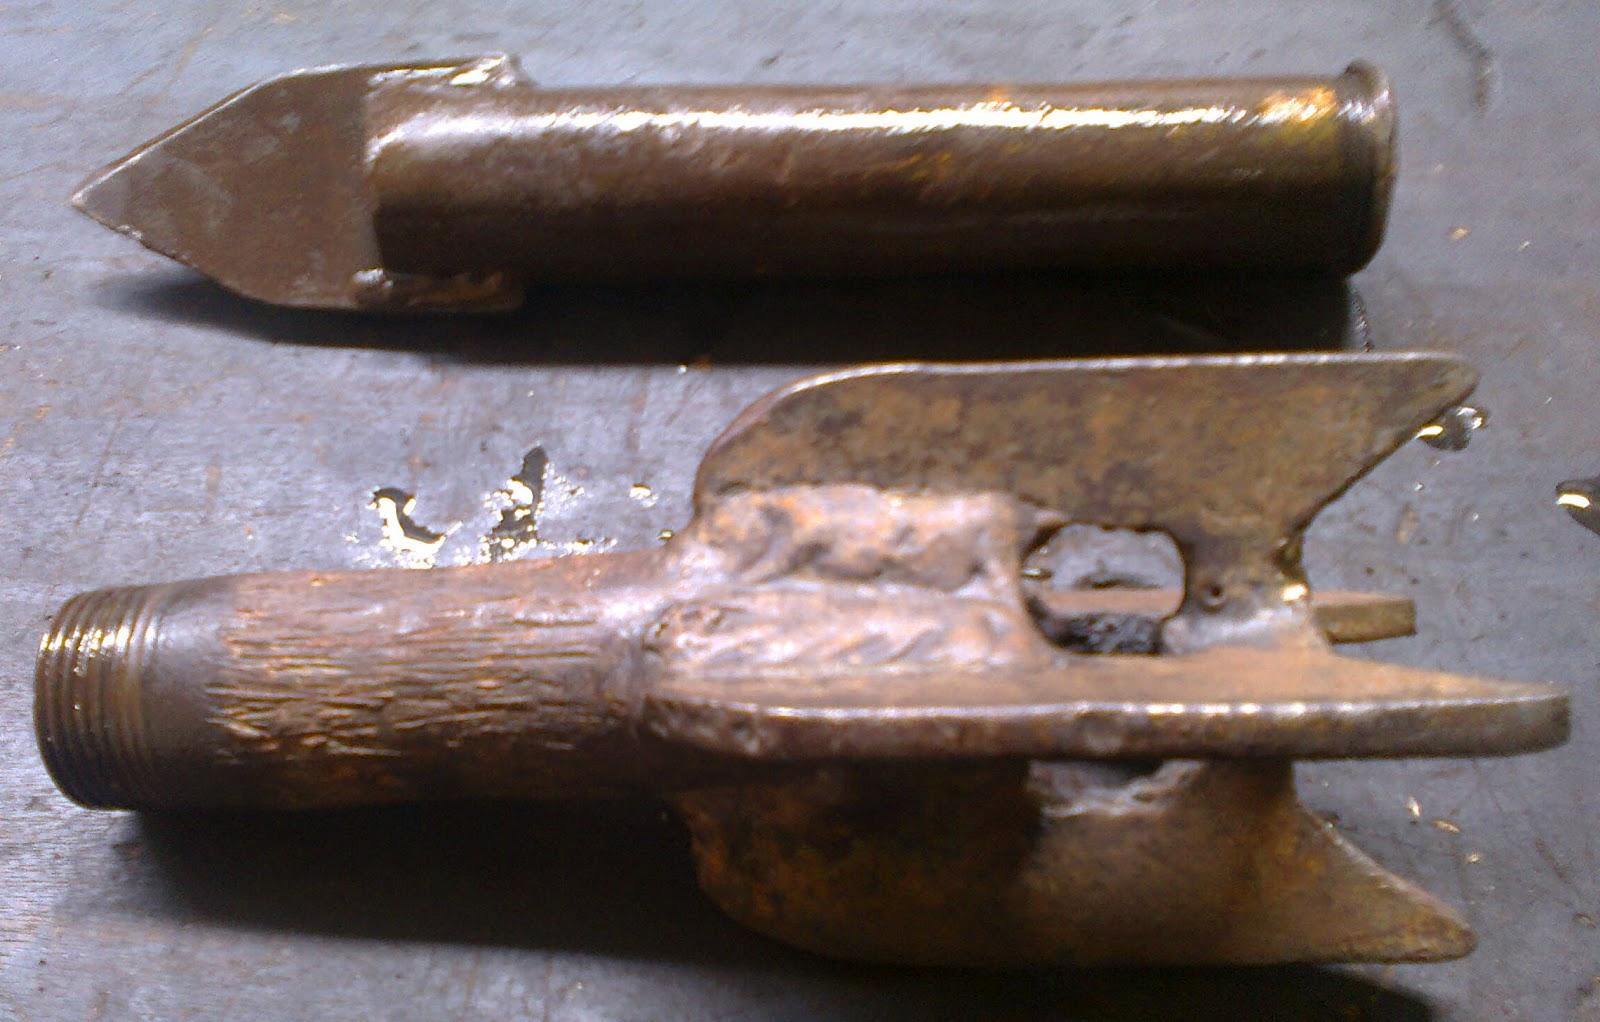 Teknik Pemesinan Smk Pgri 1 Ngawi Pembuatan Mata Bor Untuk Tangan Manual Dengan 10 Pengeboran Sumur